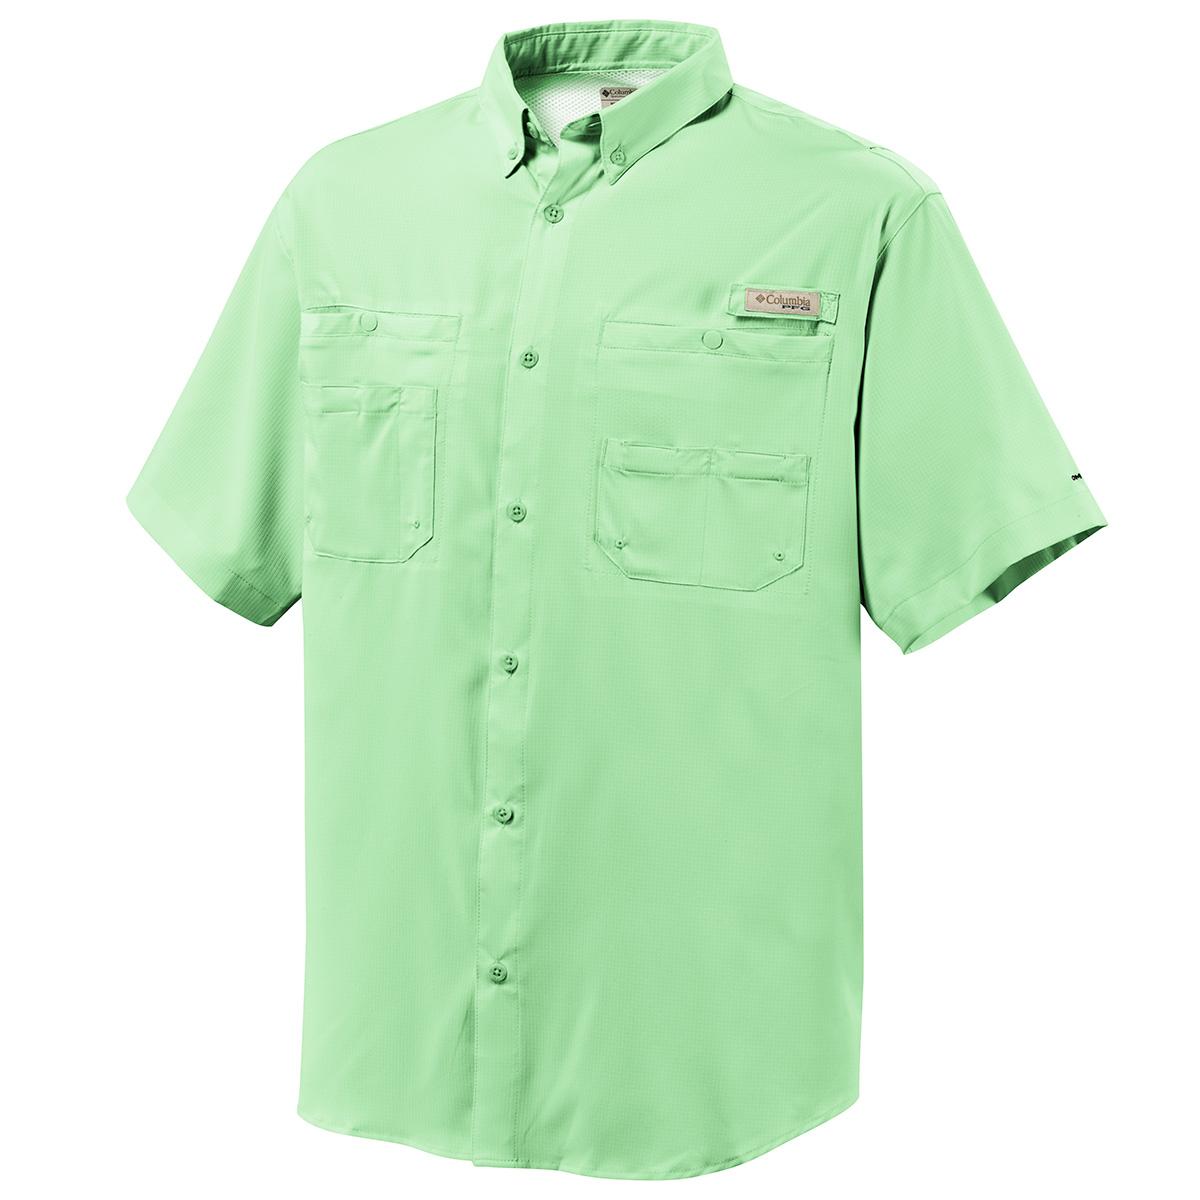 Columbia tamiami ii ss shirt 2015 fishing shirts ebay for Columbia cotton fishing shirt